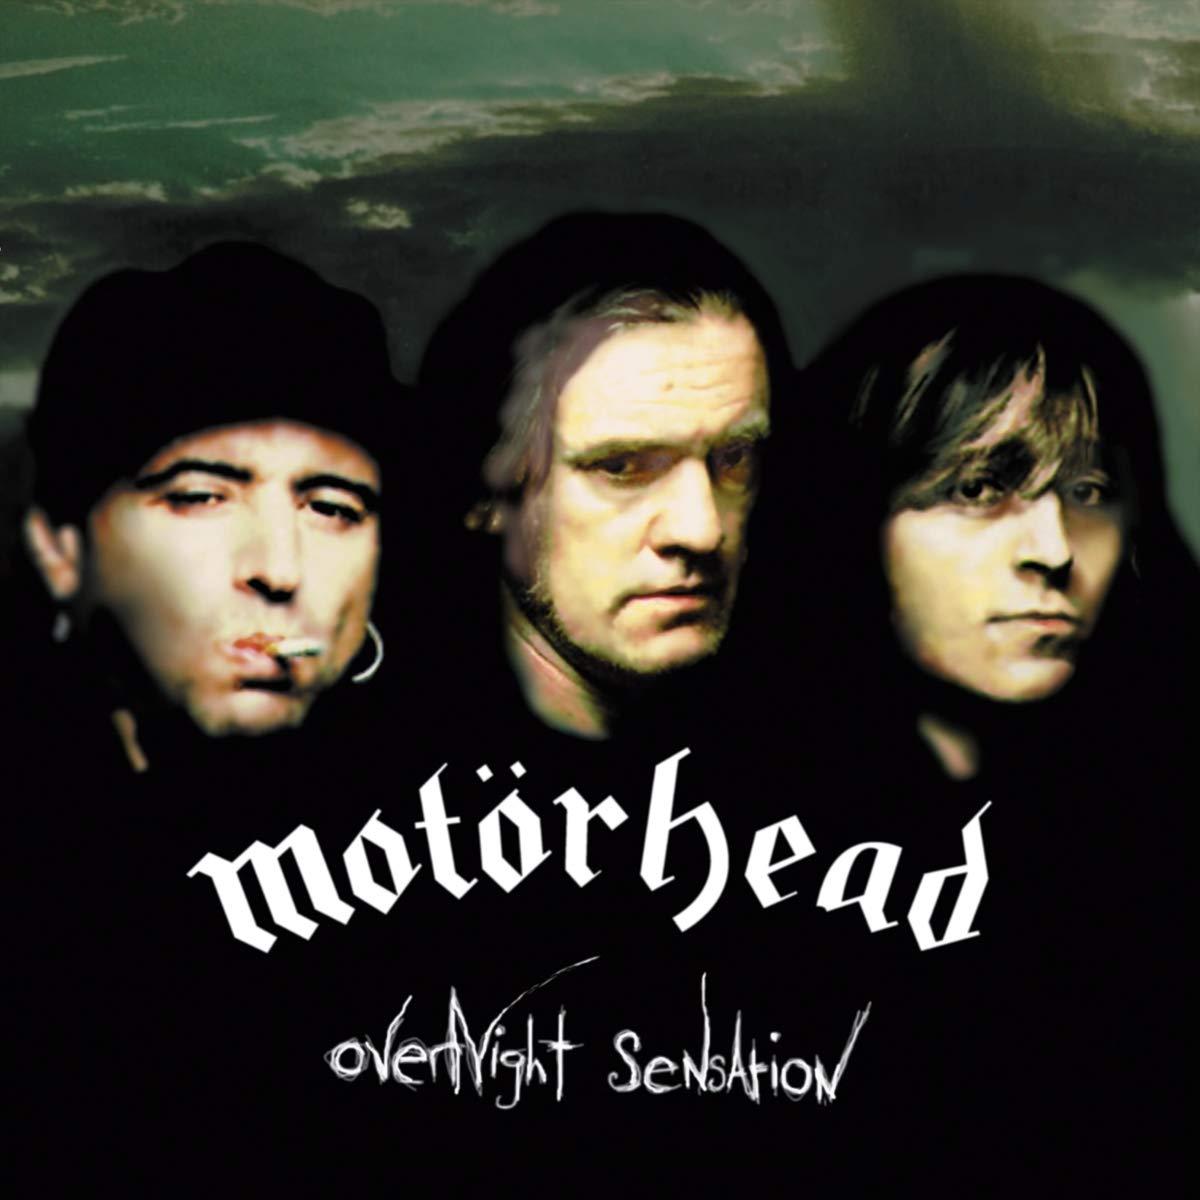 Motörhead - Overnight Sensation (LP-Vinilo)